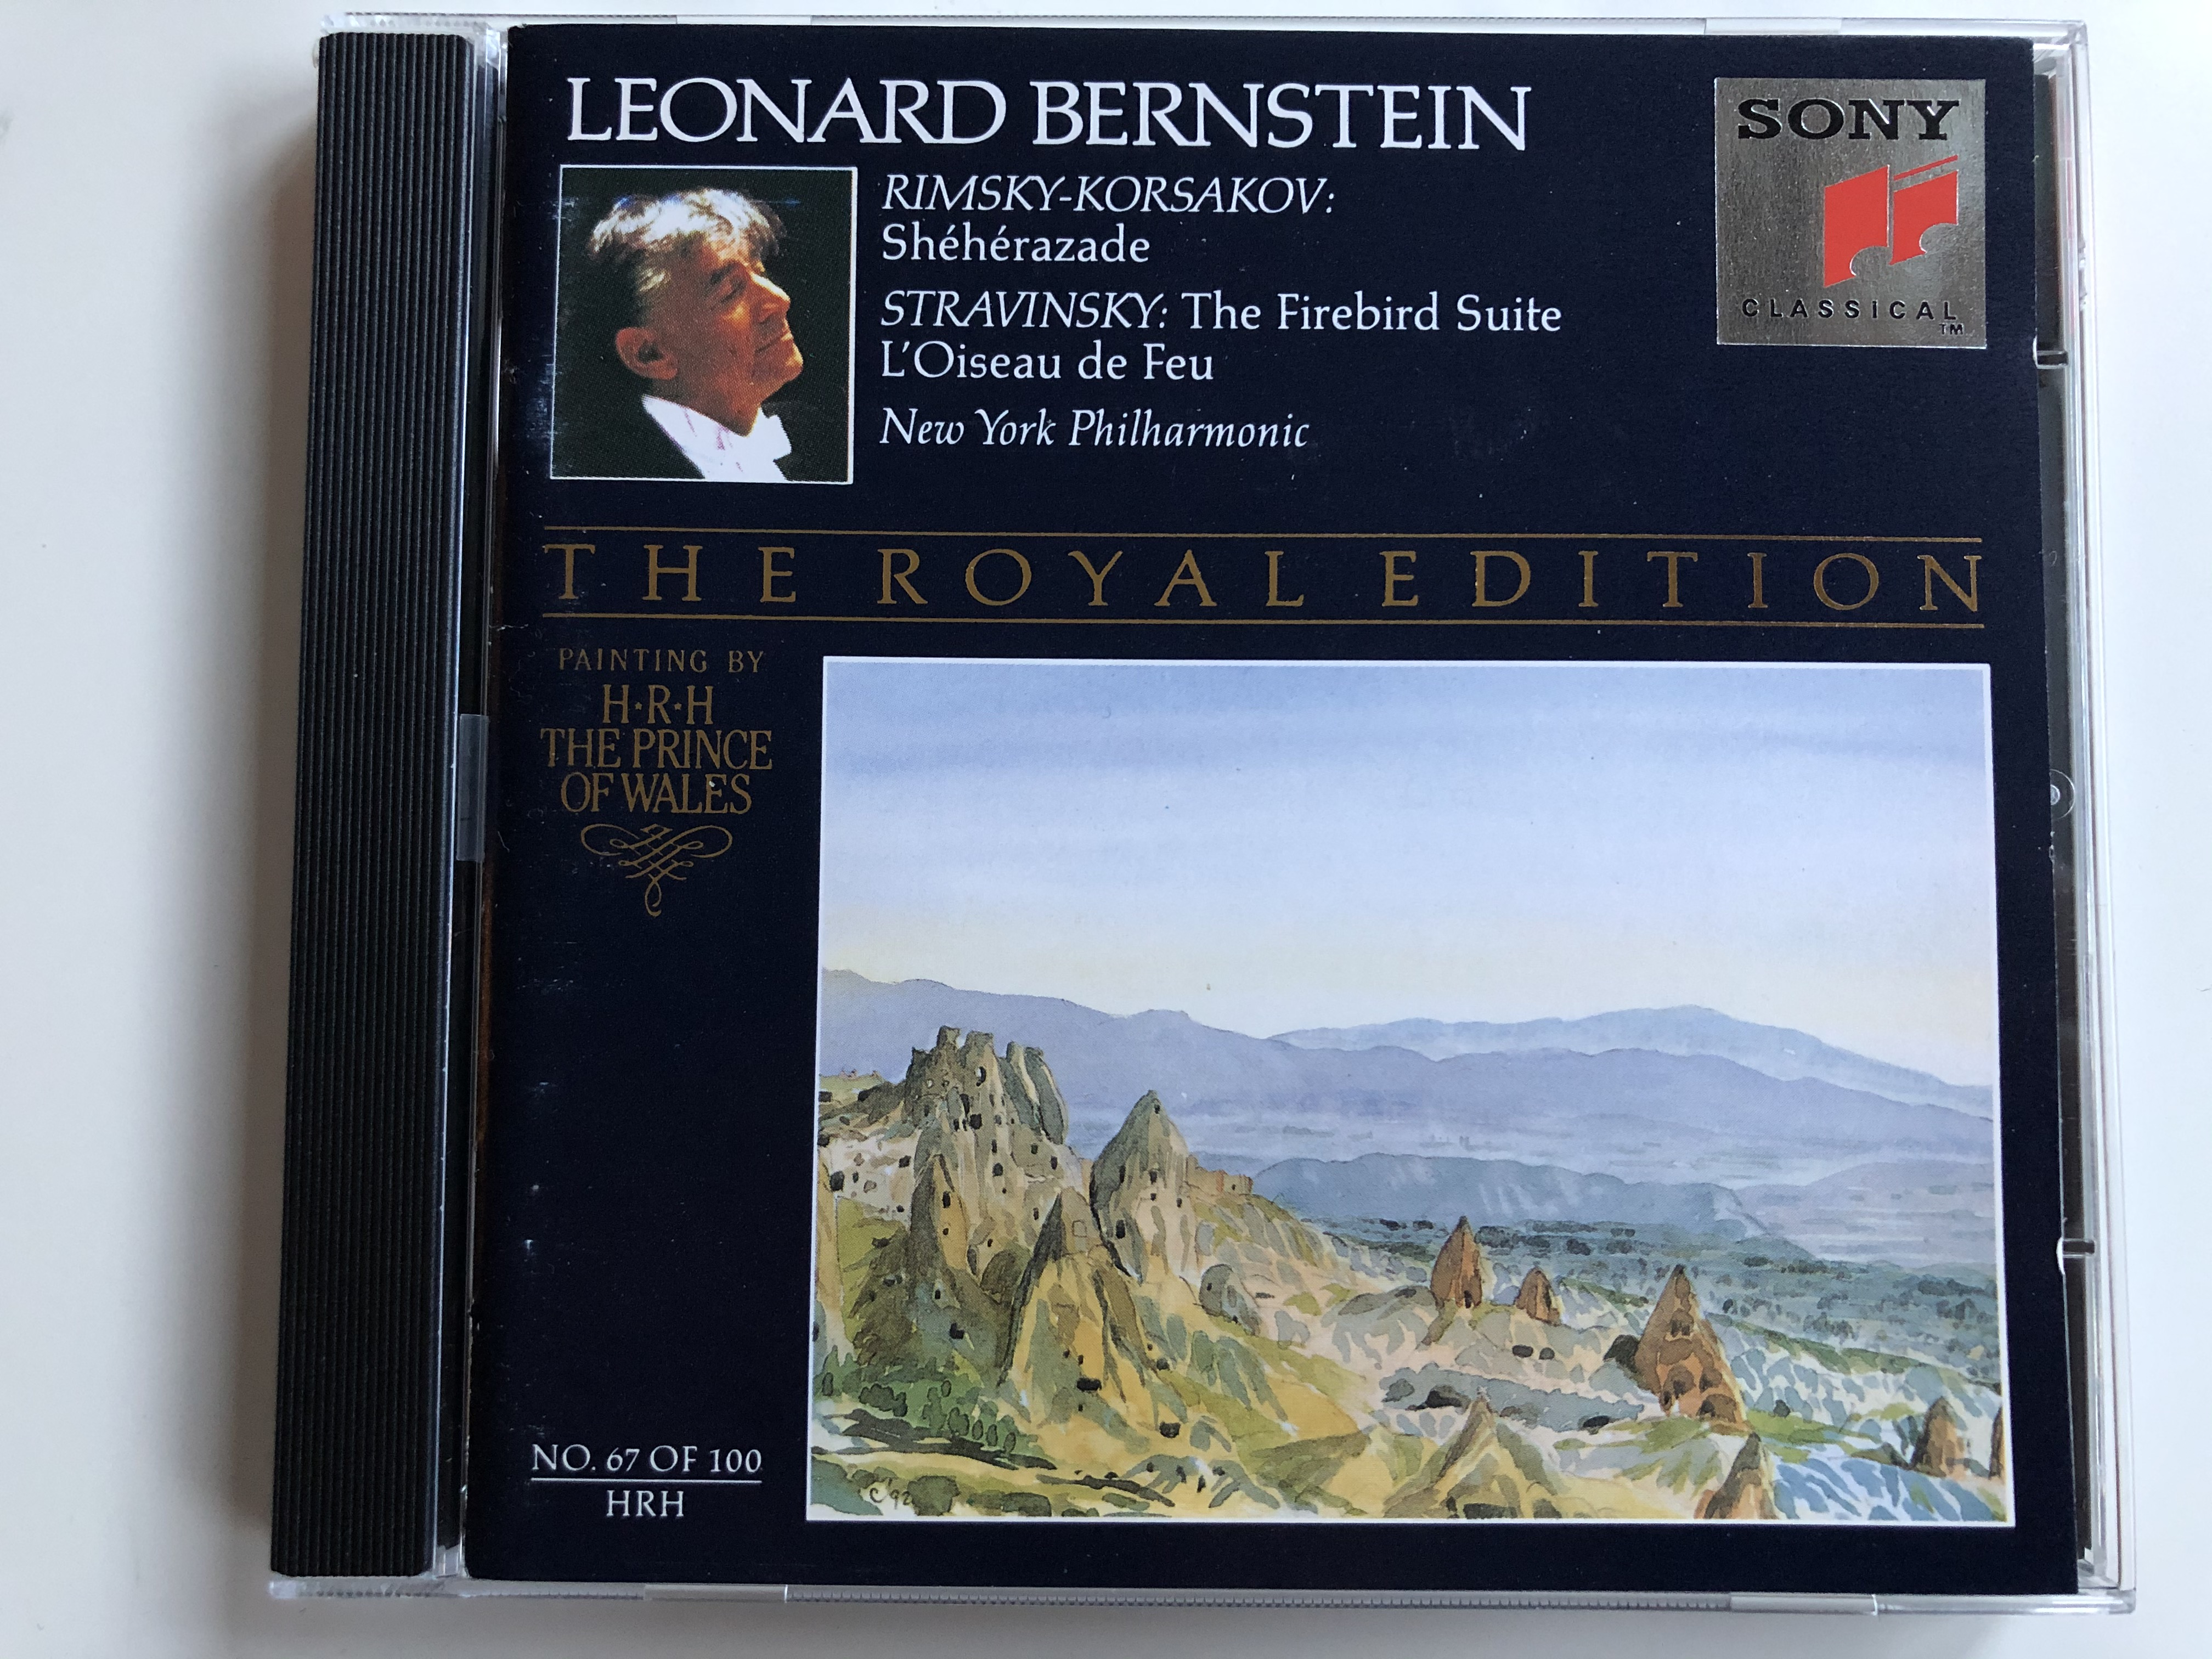 leonard-bernstein-rimsky-korsakov-sh-h-razade-stravinsky-the-firebird-suite-l-oiseau-de-feu-new-york-philharmonic-the-royal-edition-painting-by-h.r.h.-the-prince-of-wales-sony-classical-au-1-.jpg